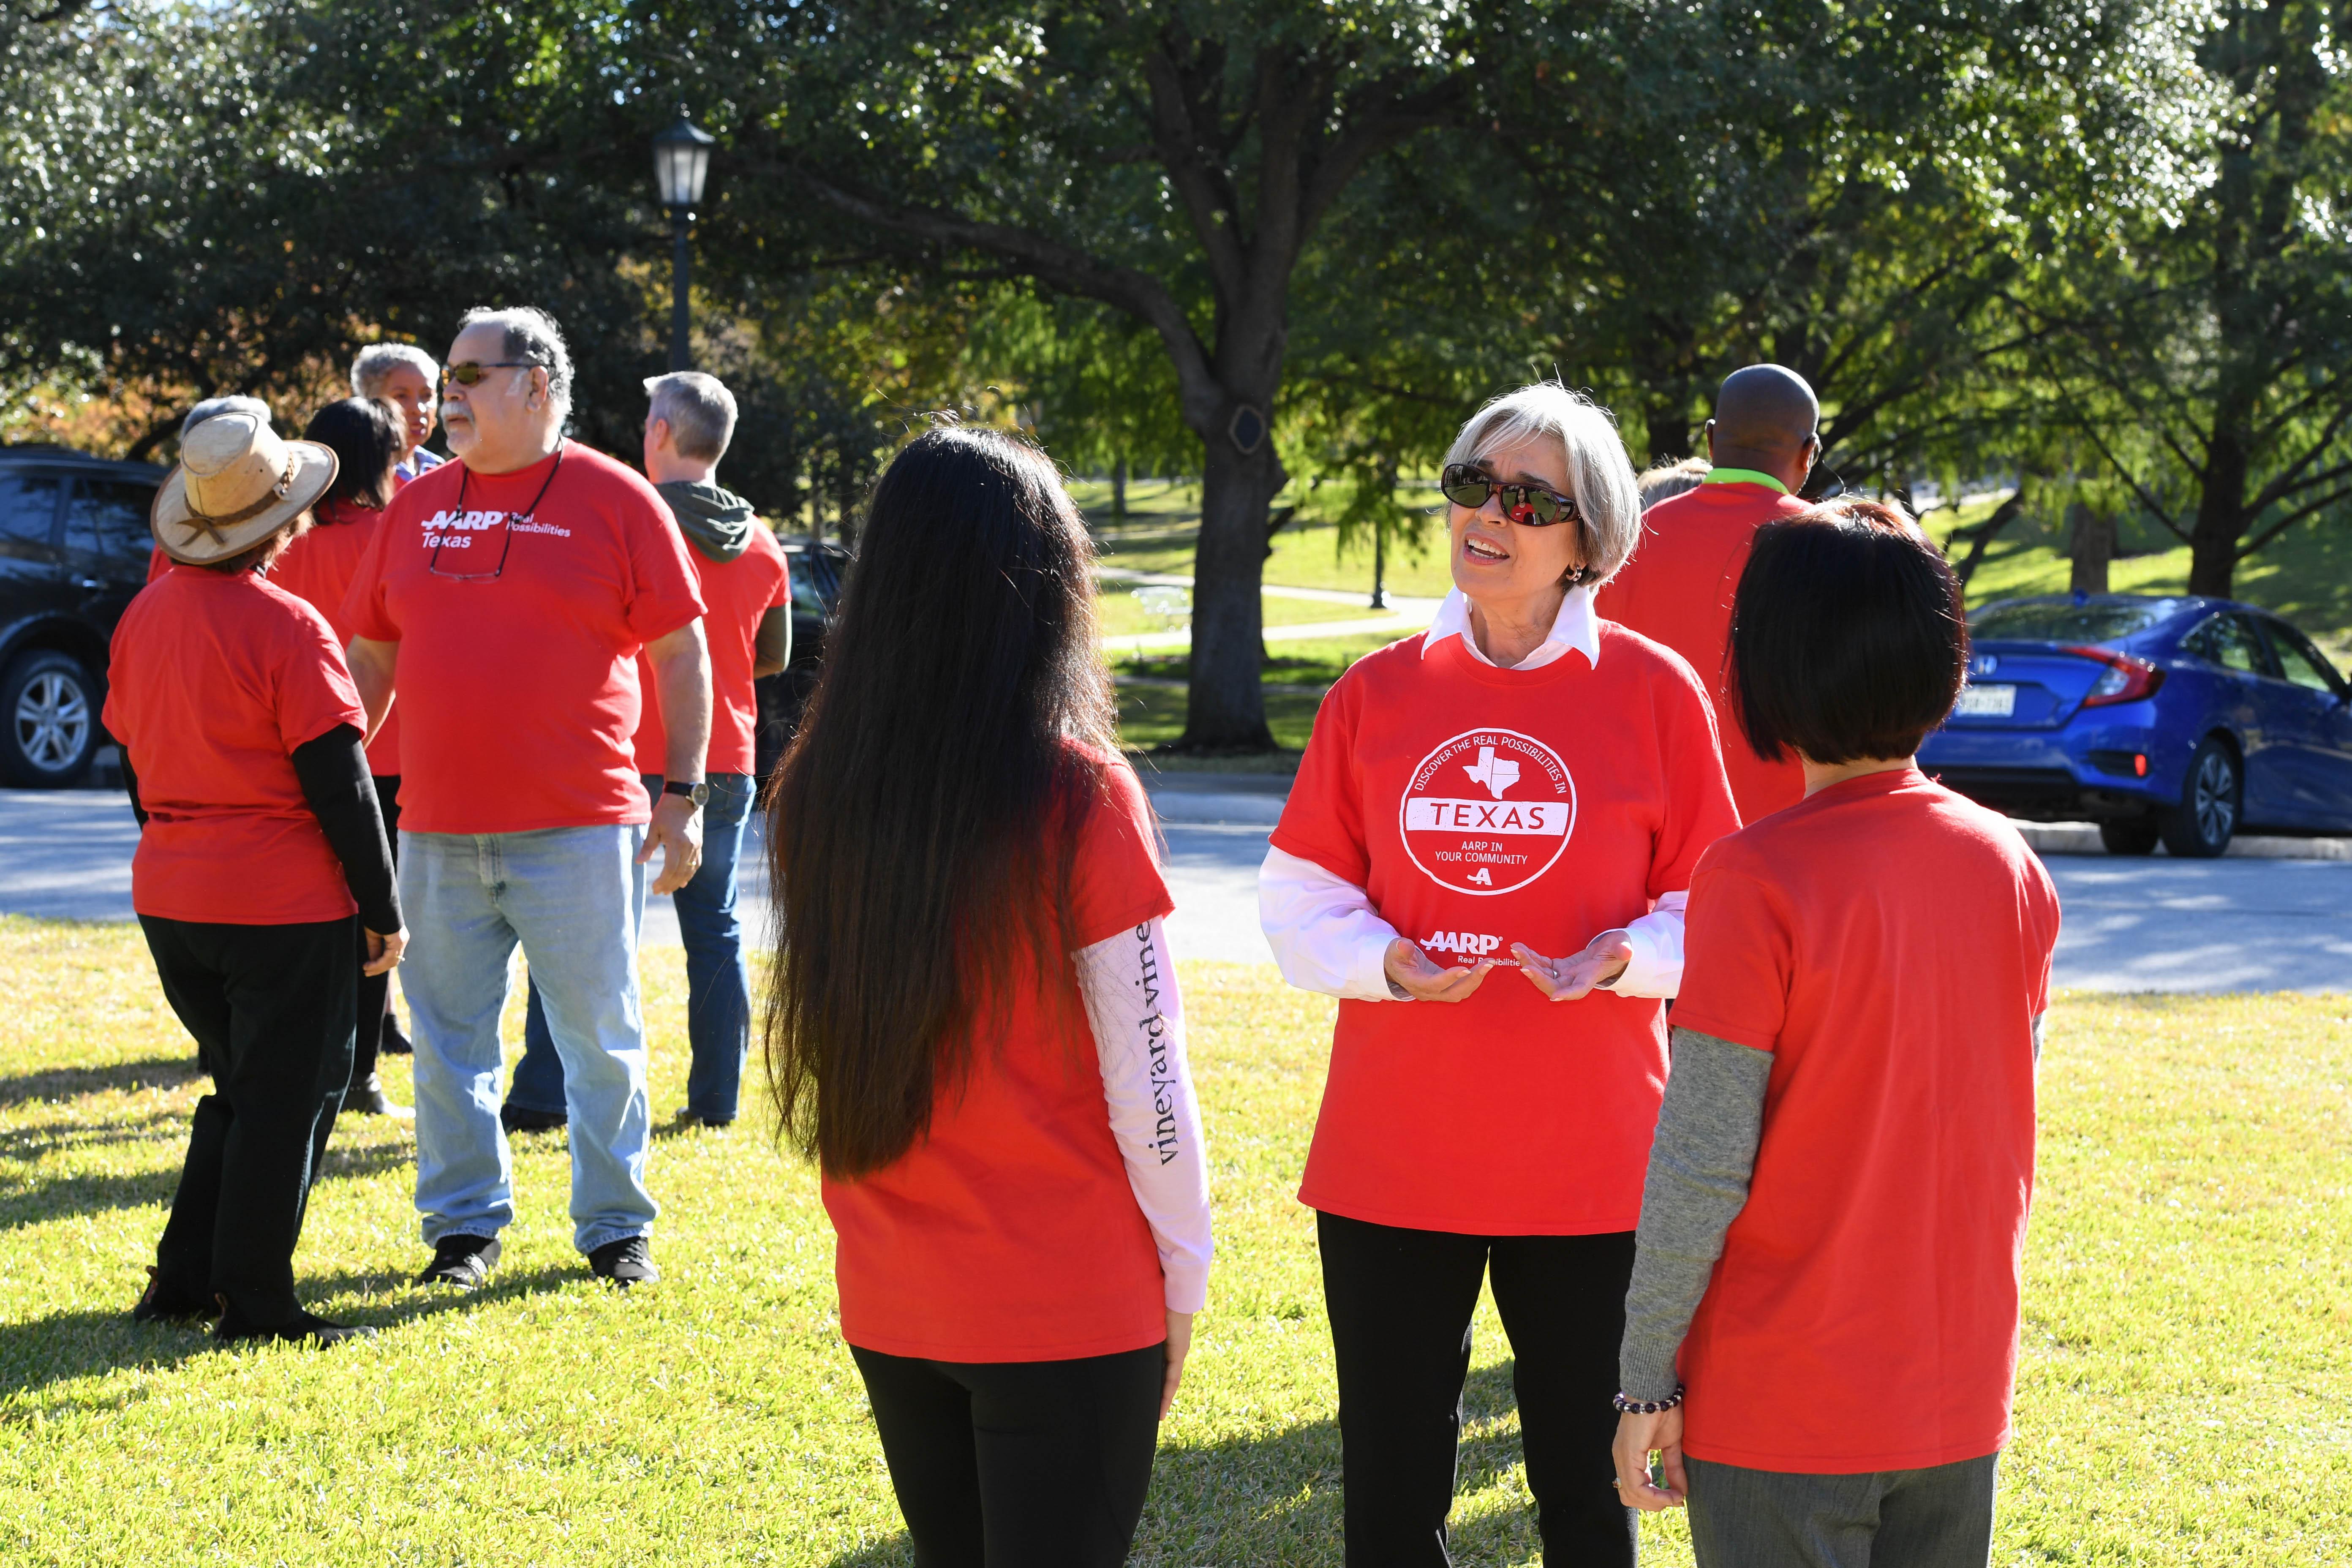 Join the AARP Dallas-Fort Worth Volunteer Team